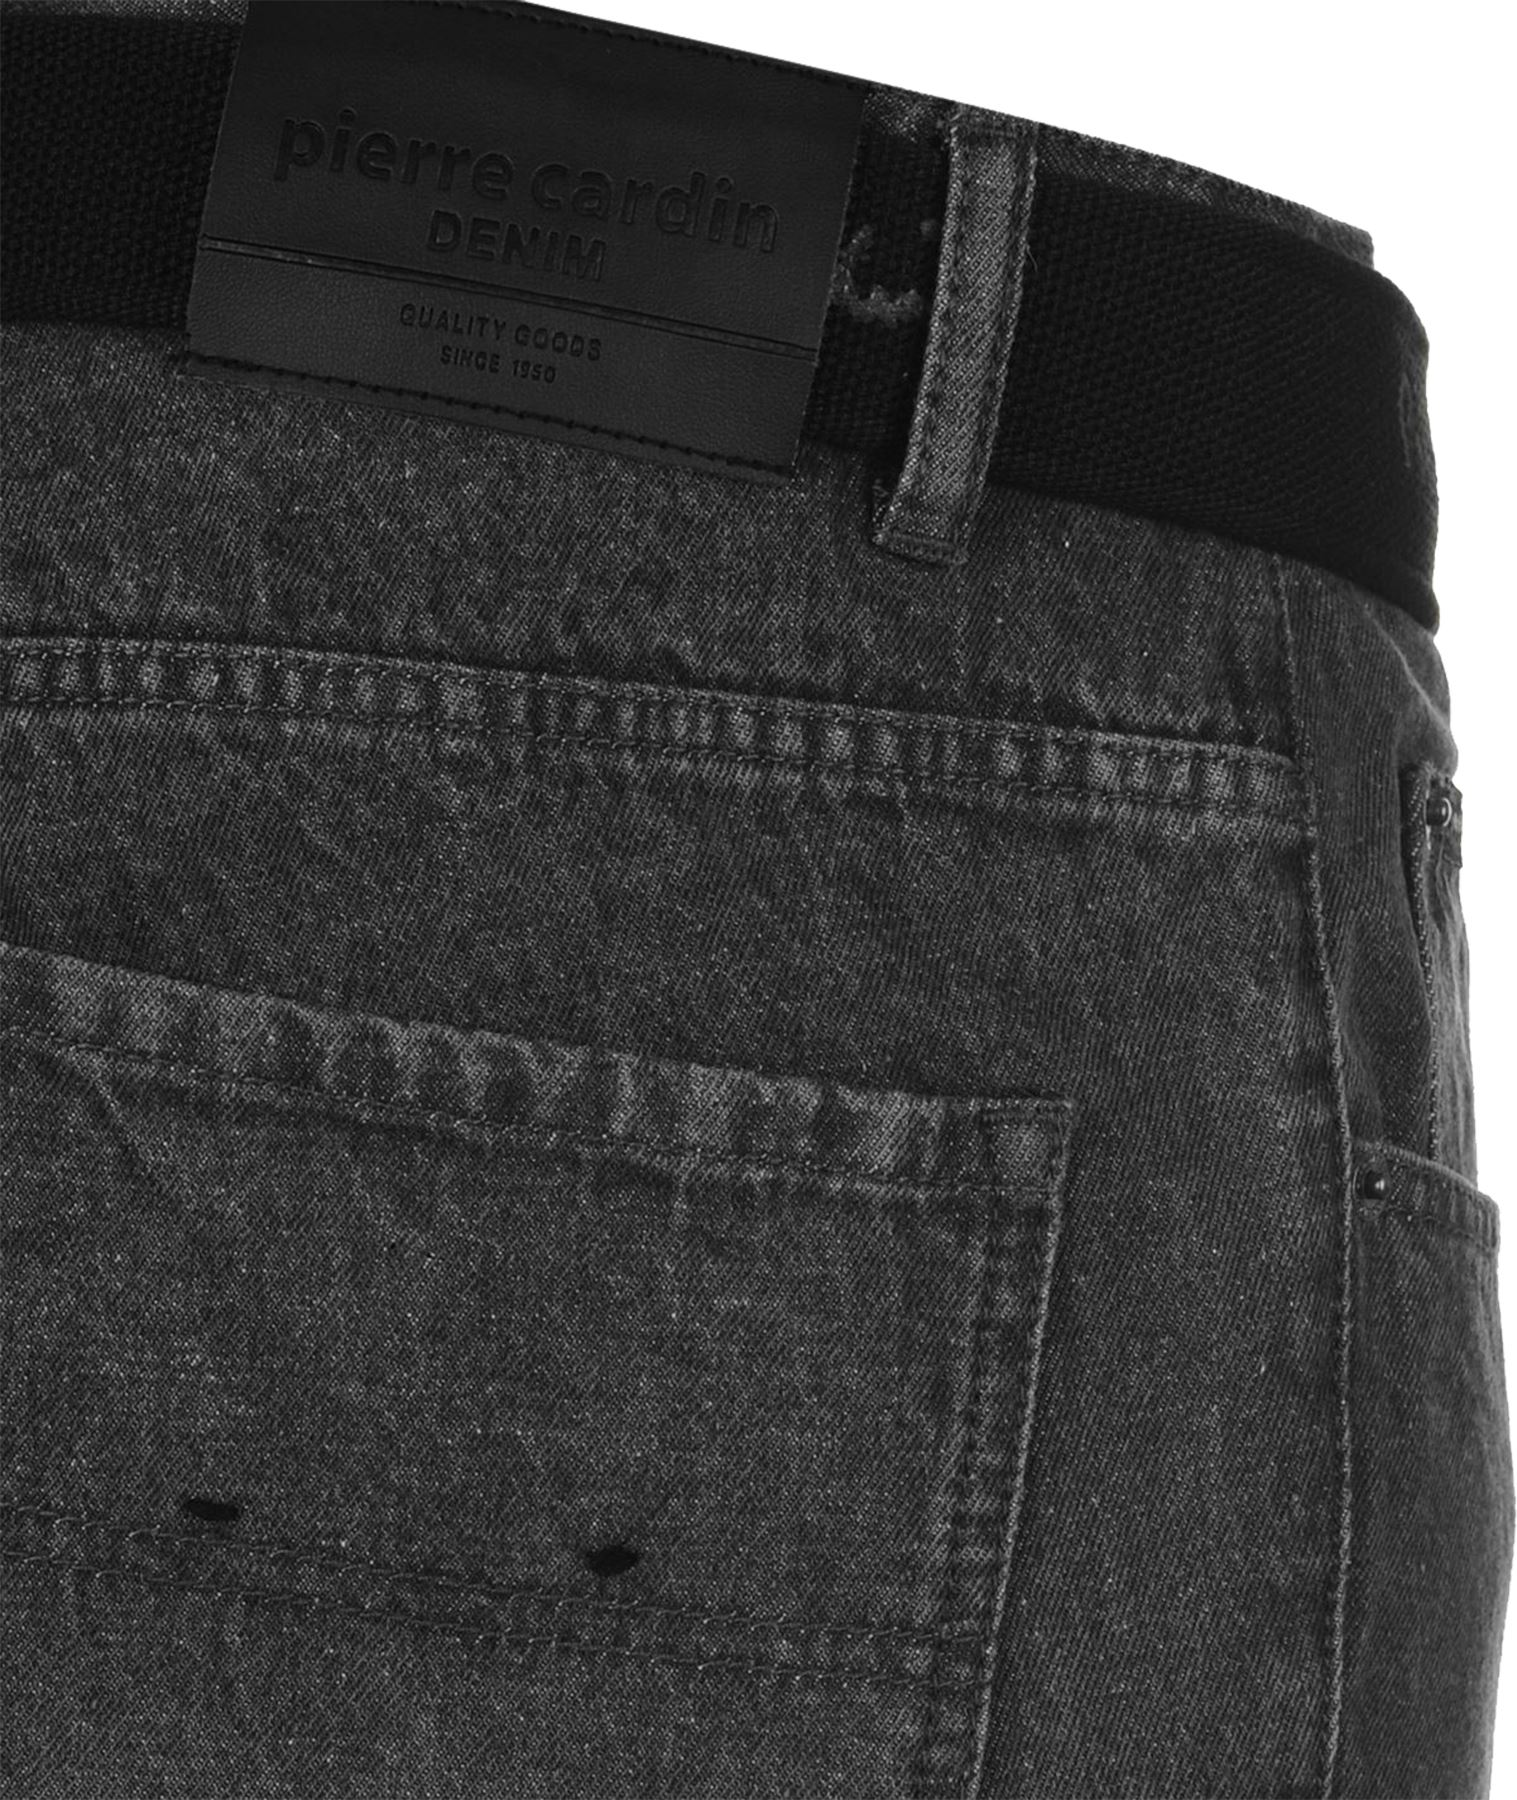 Mens-Belted-Denim-Jeans-Straight-Leg-Regular-Fit-Pierre-Cardin-Pants-Big-Tall thumbnail 9